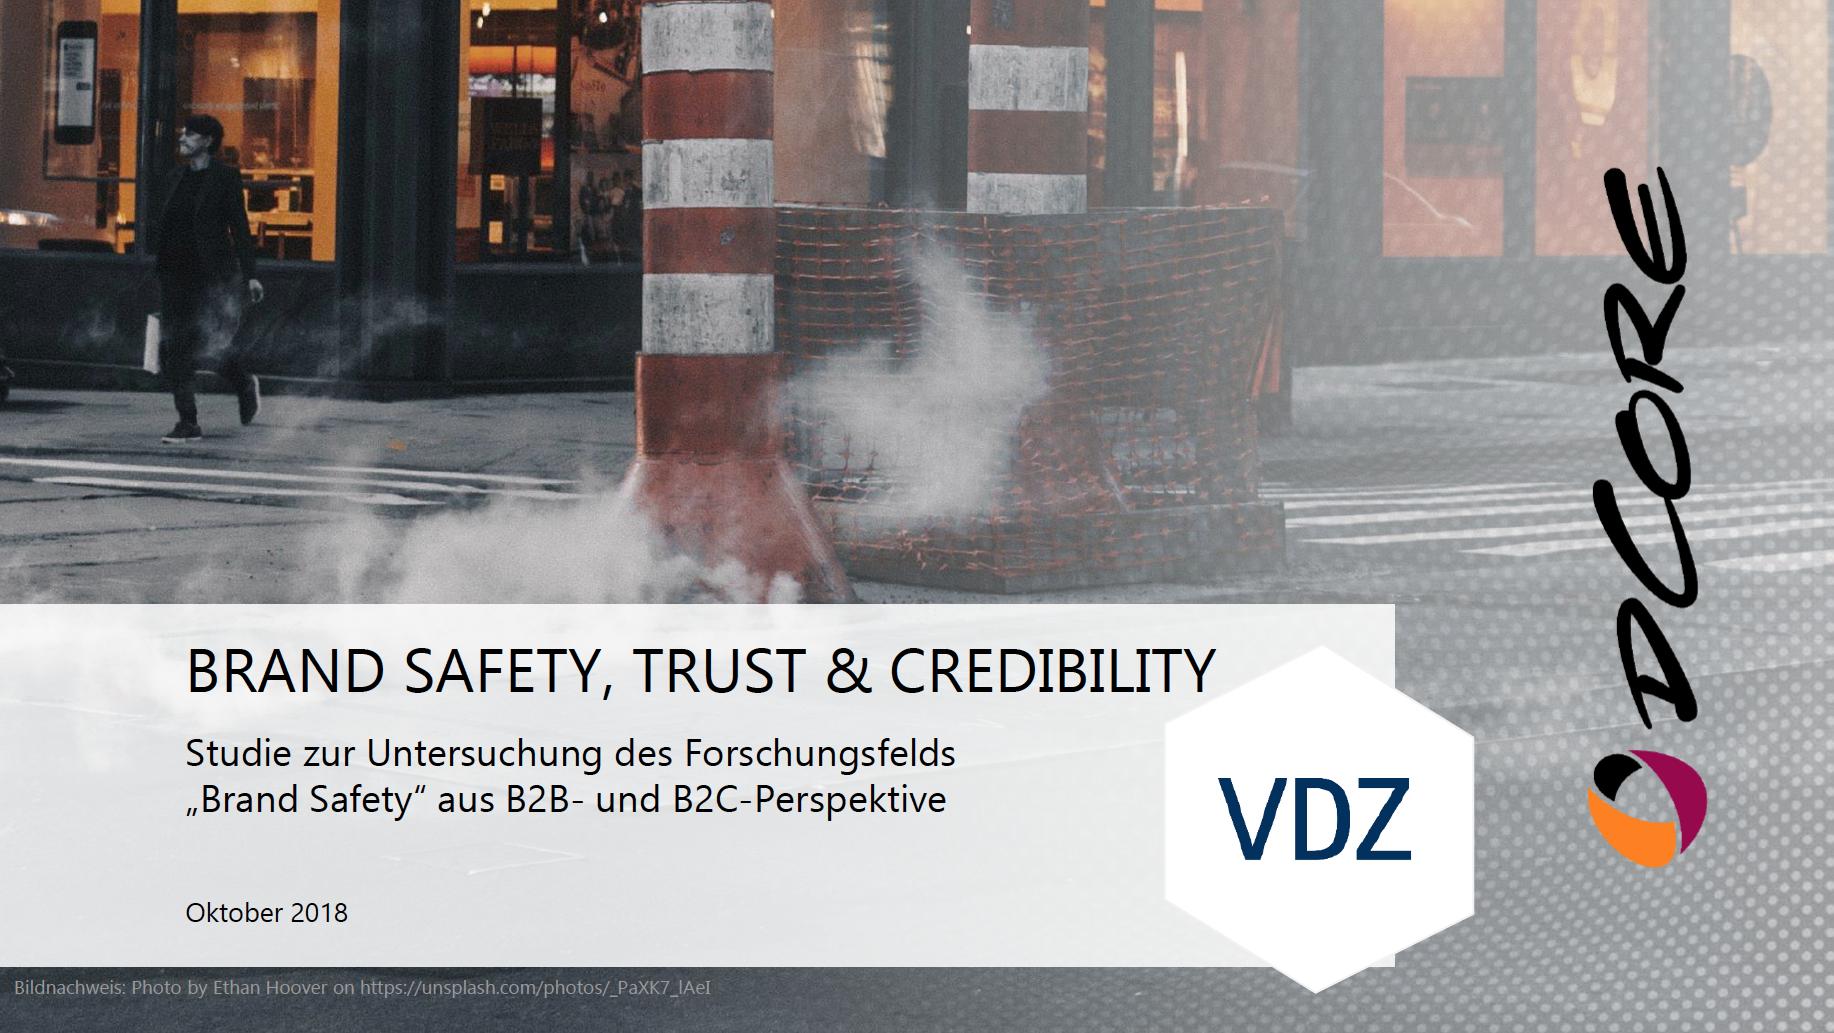 vdz-studie-brand safety-trust-credibility